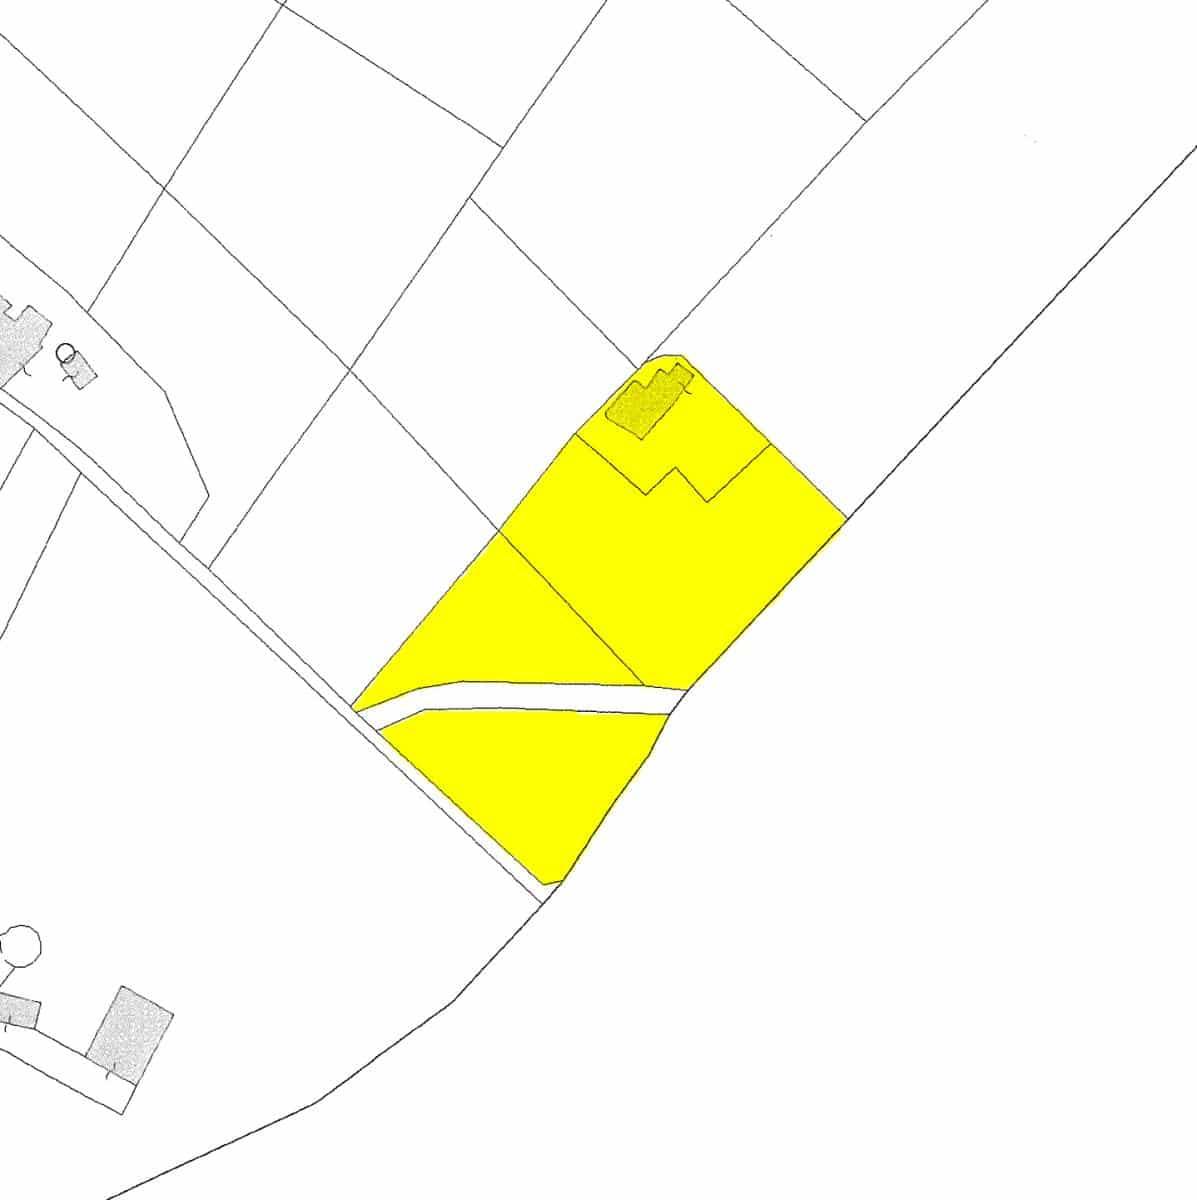 Vendita trulli abitabili – Contrada Grotta, Ostuni (Brindisi)